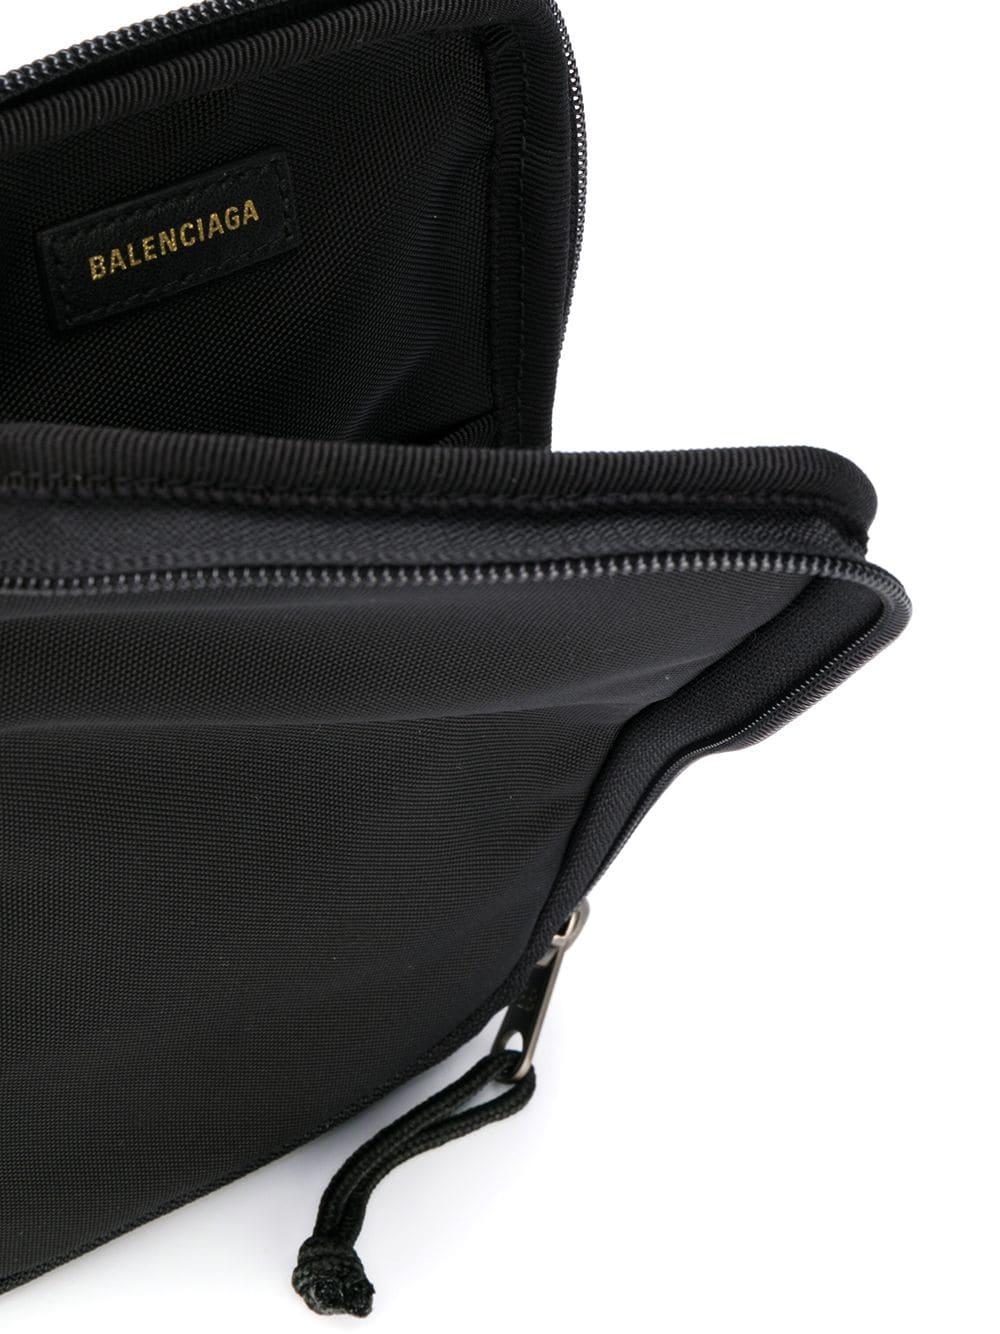 Picture of Balenciaga | Logo Patch Messenger Bag